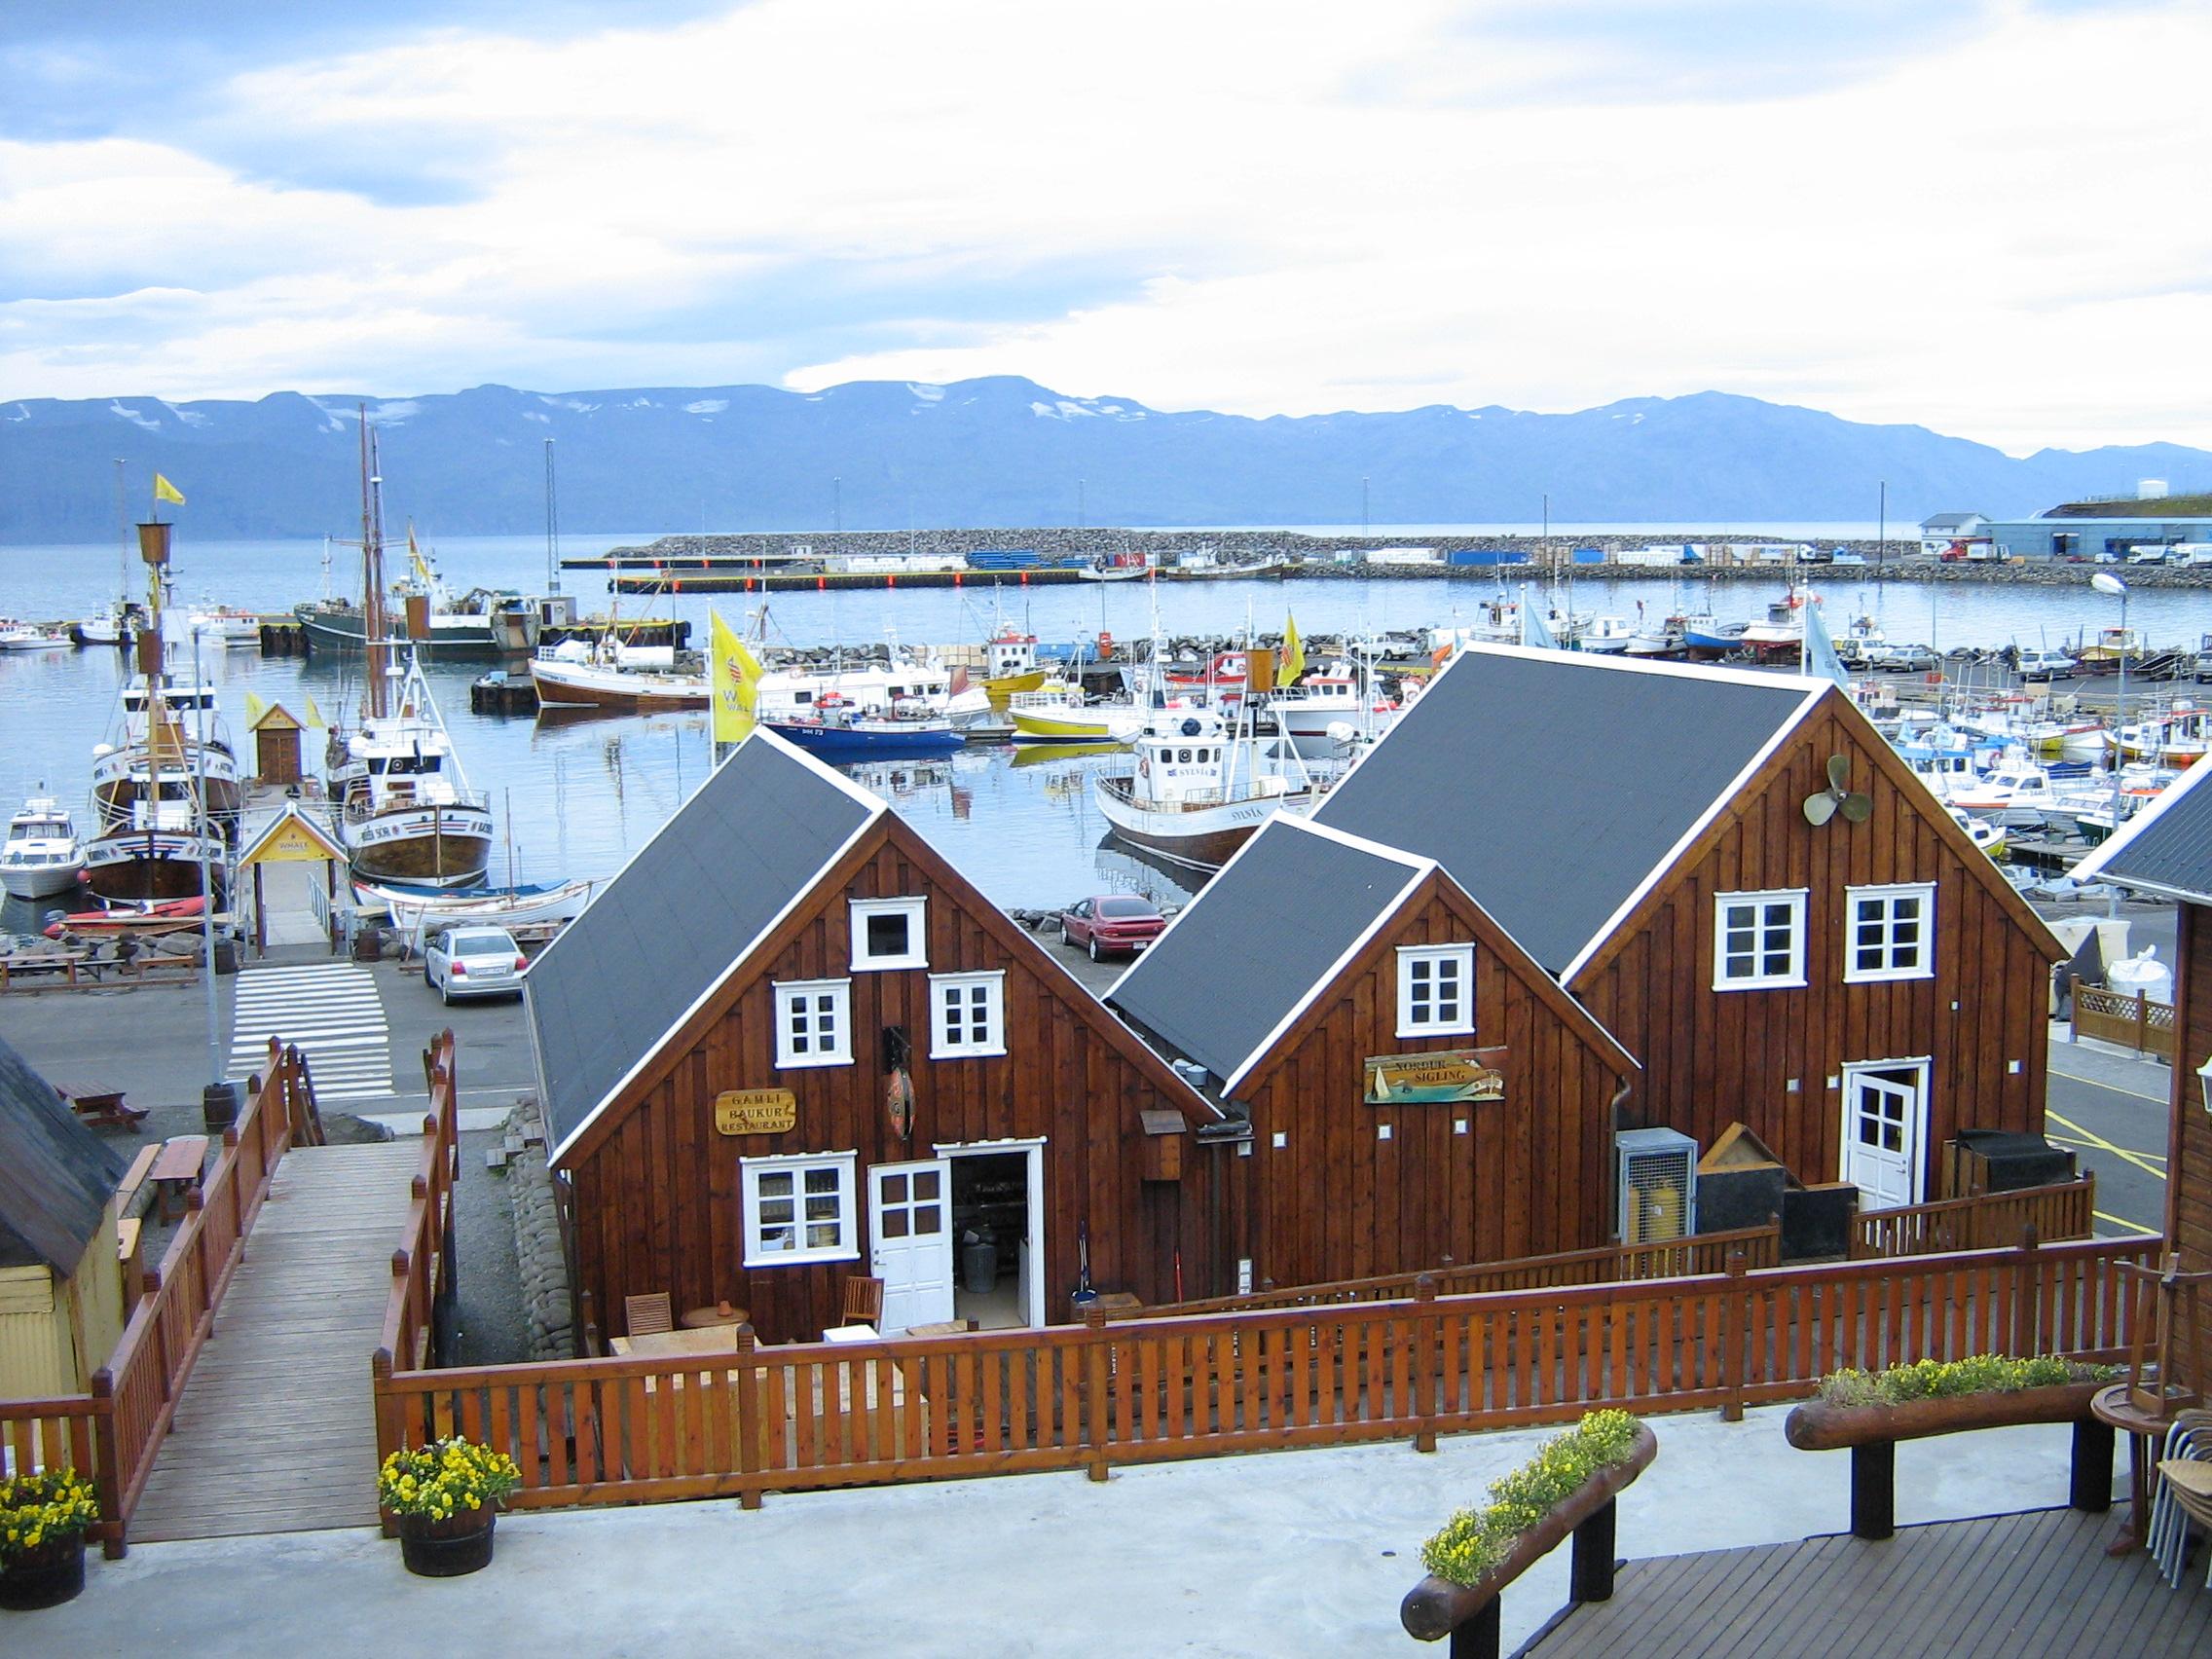 Iceland_Husavik_Harbour